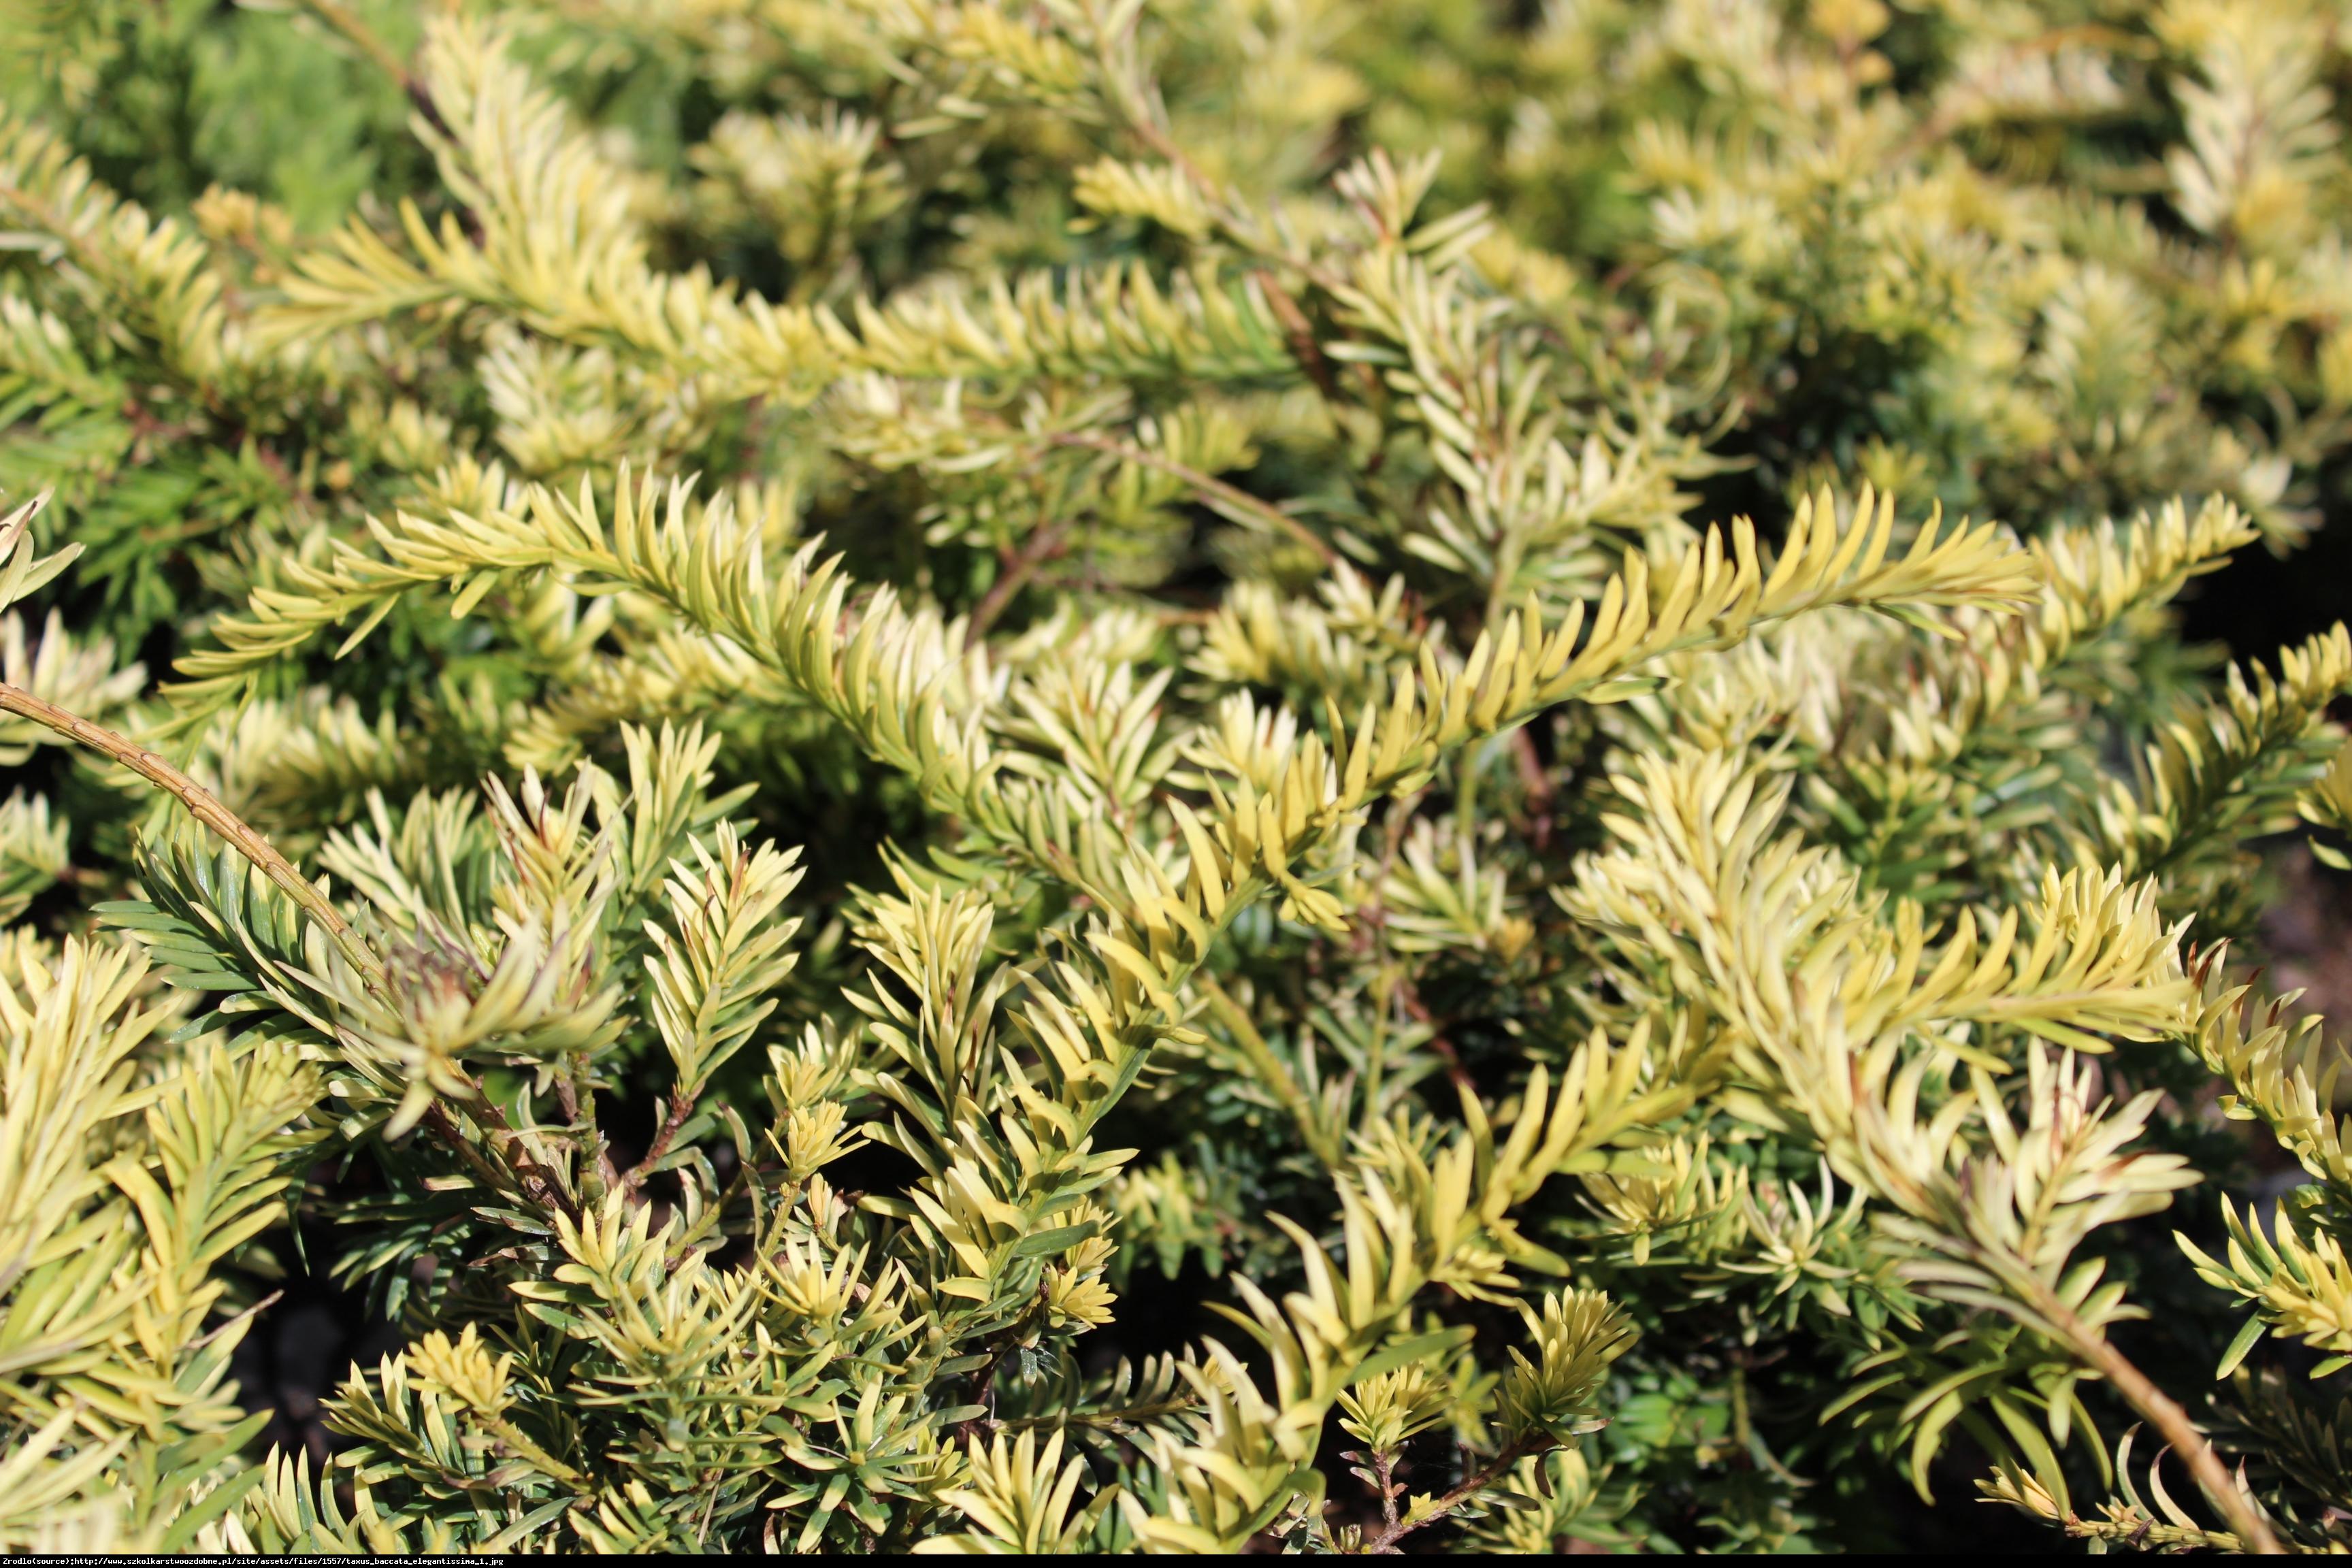 Cis pospolity Elegantissima  - Taxus baccata  Elegantissima